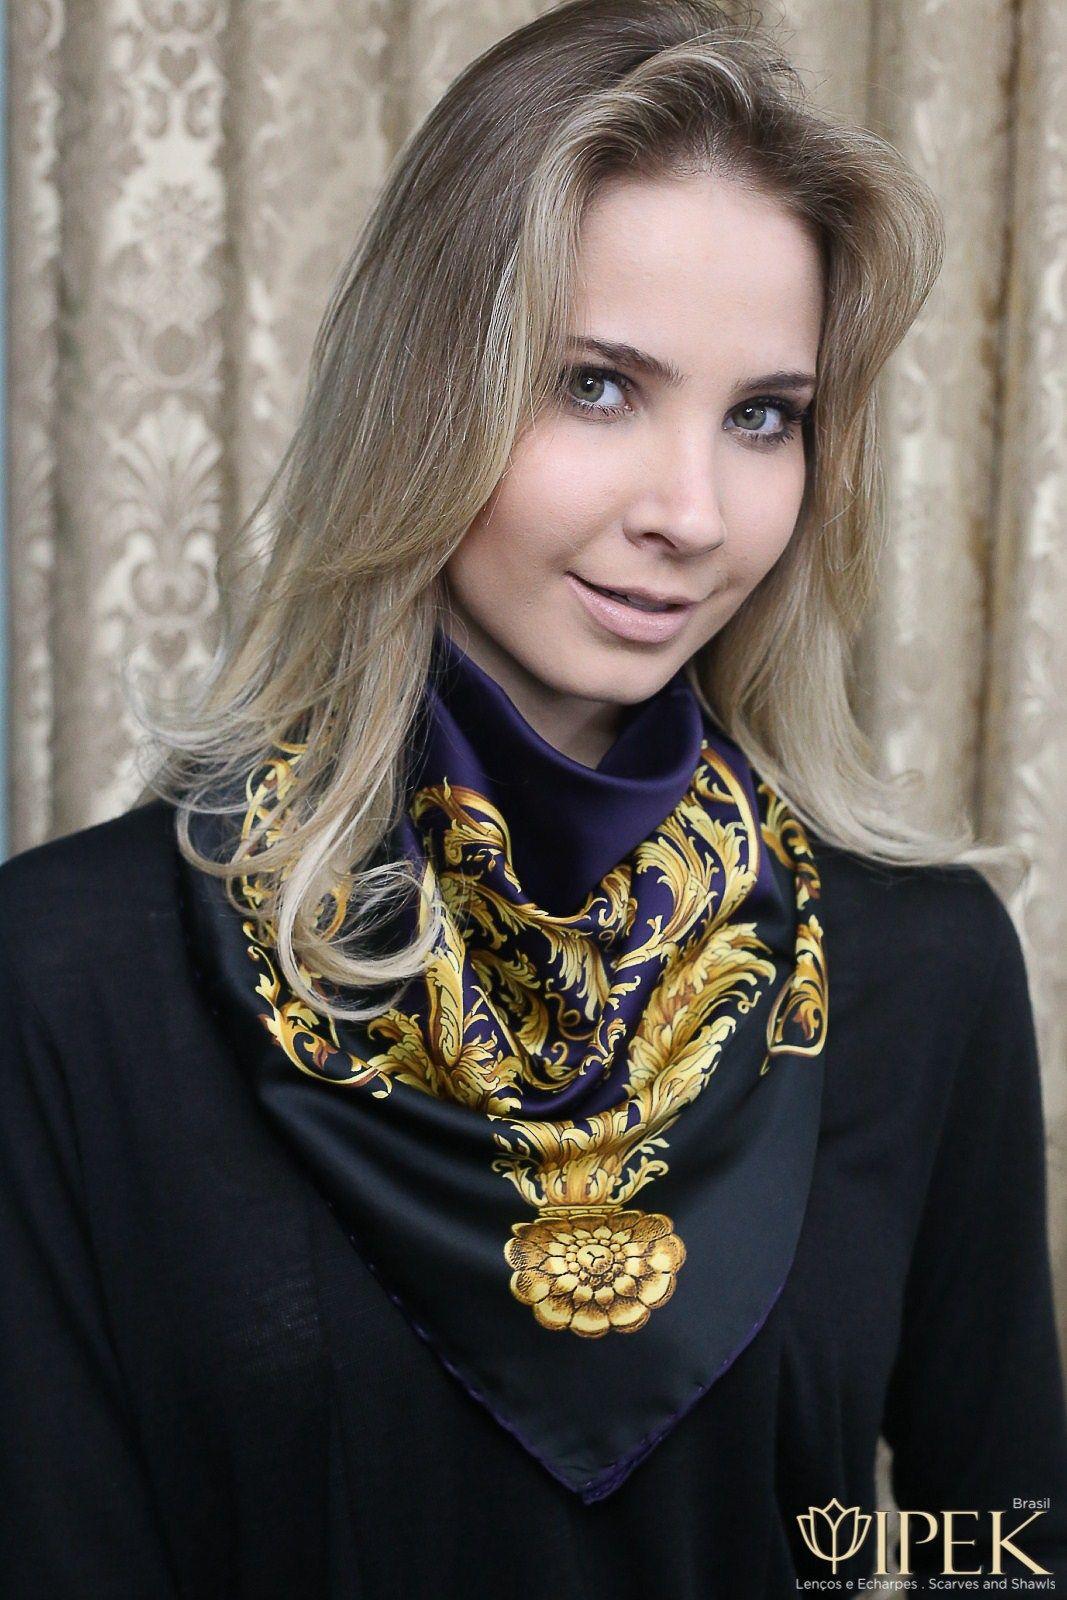 len o seda ipek brasil silkscarves my style pinterest halstuch seide und hals. Black Bedroom Furniture Sets. Home Design Ideas